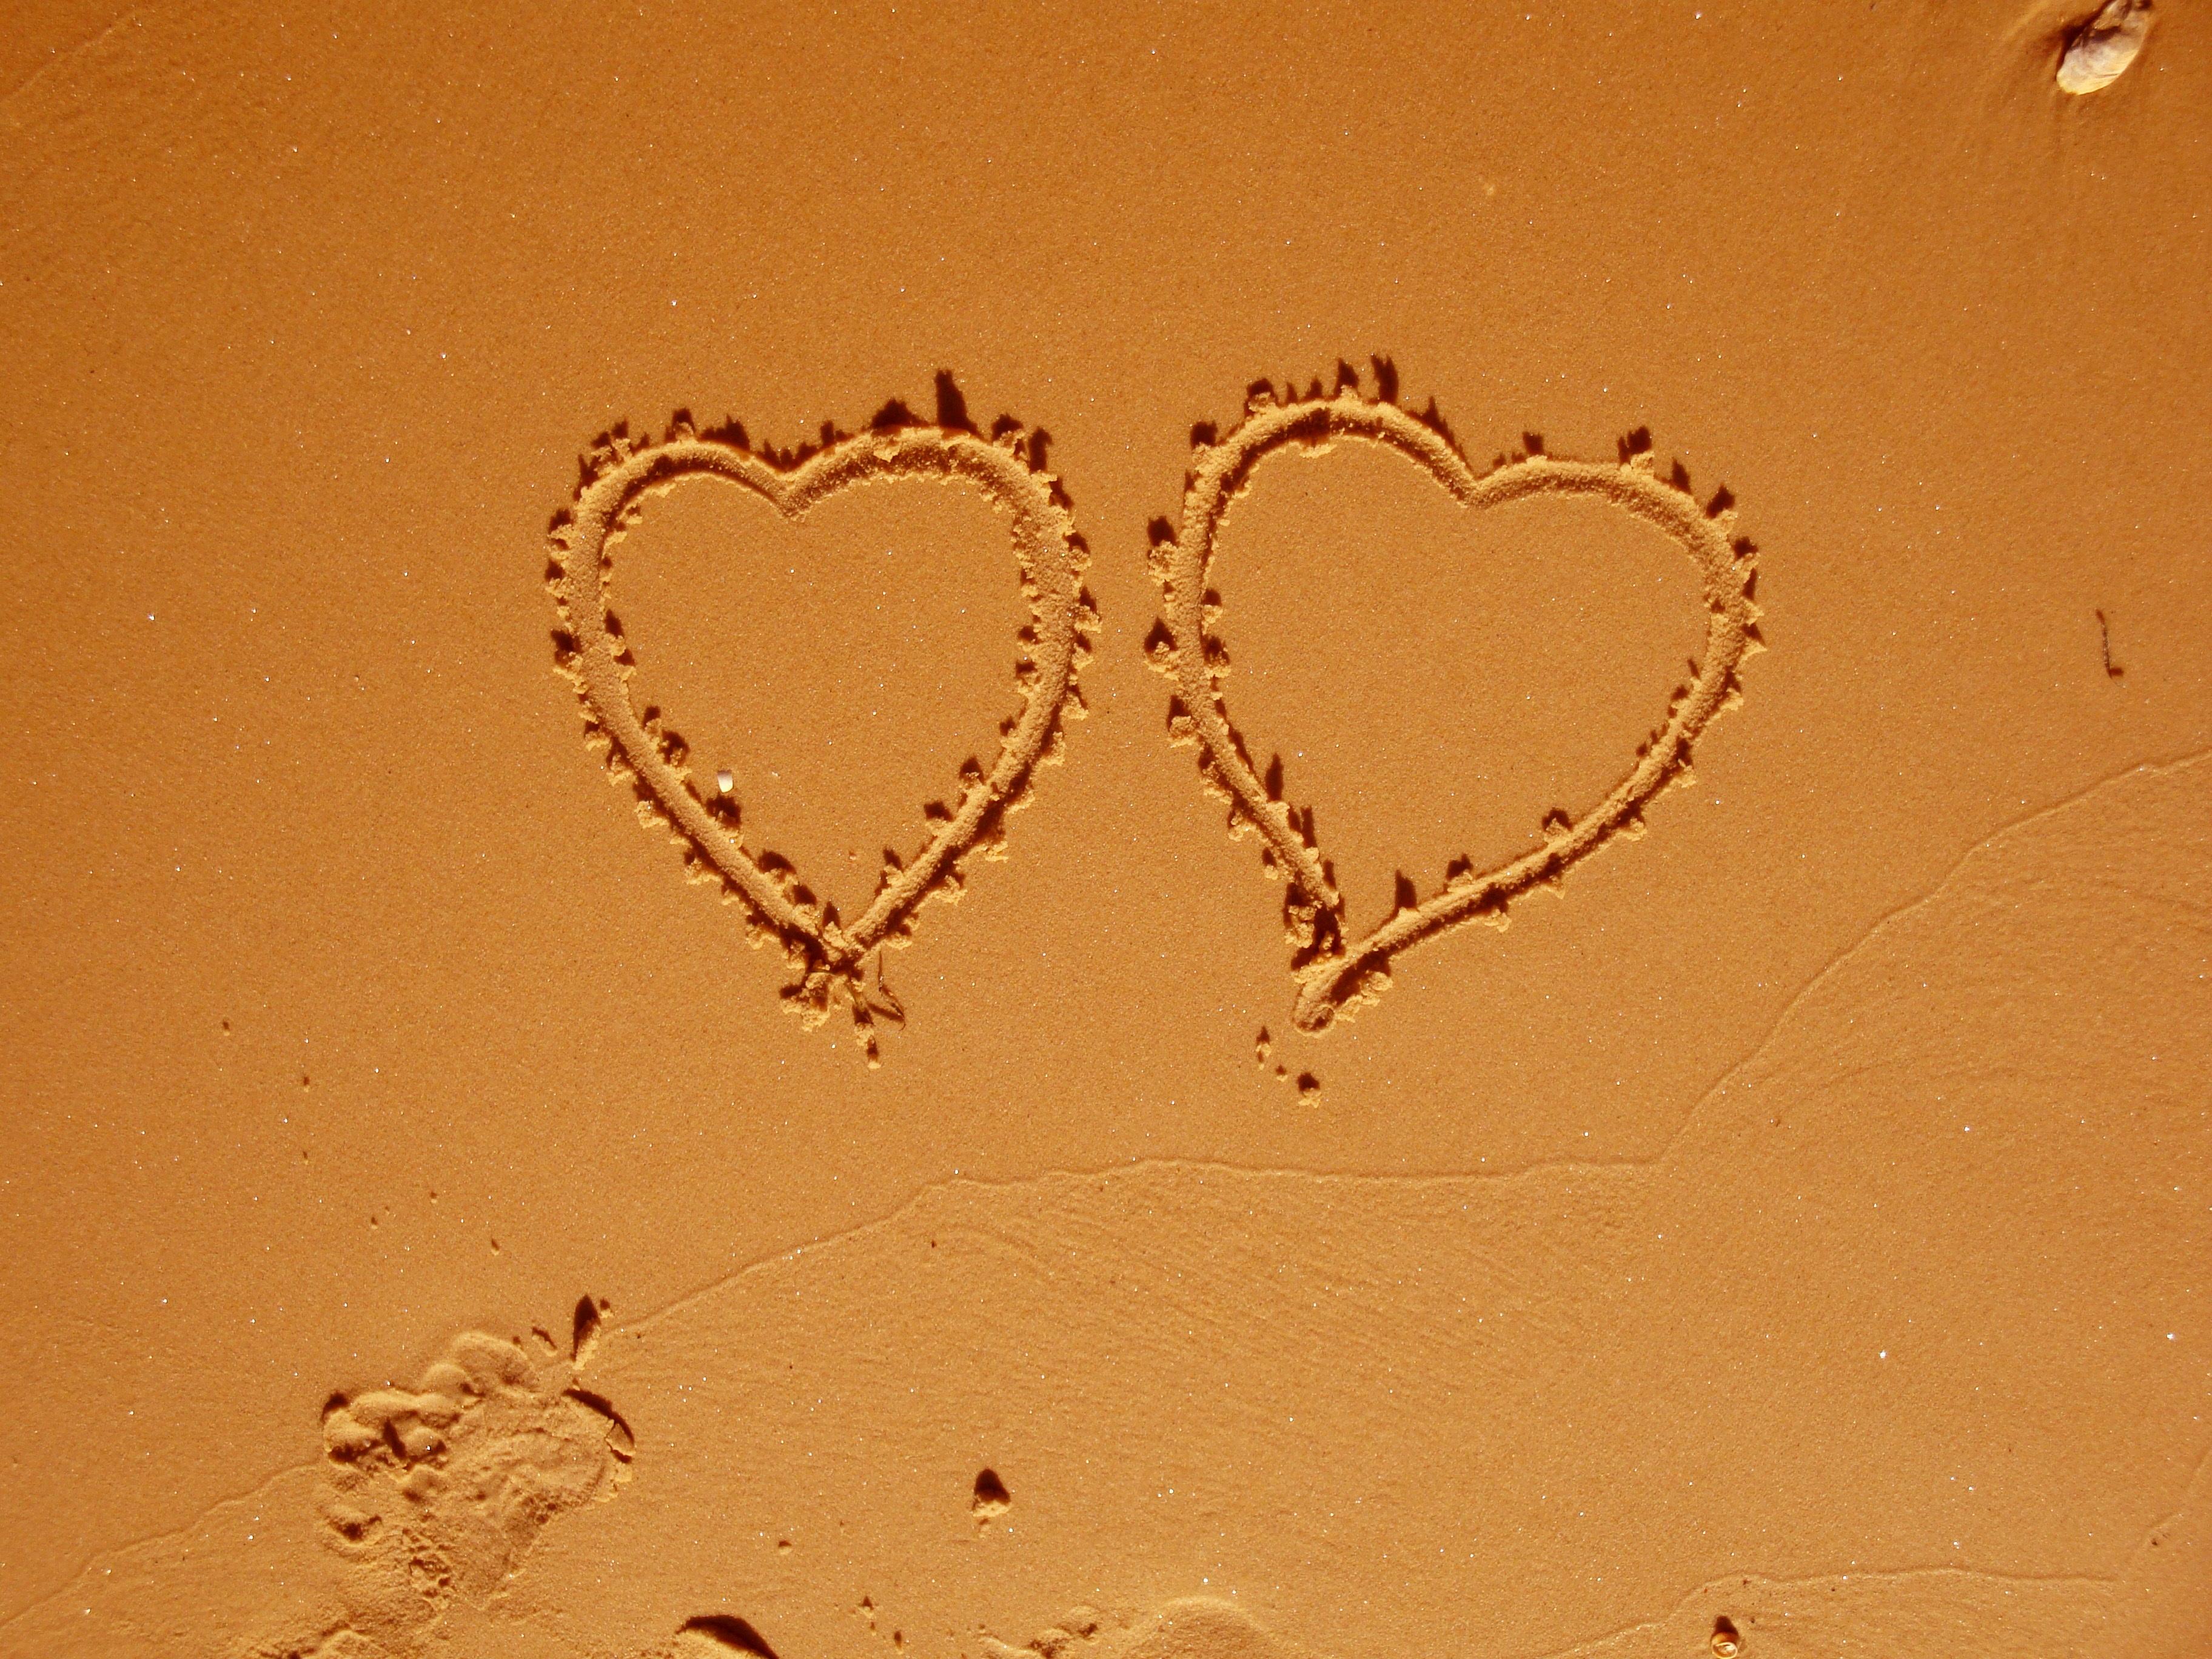 Free images hand beach sand number love heart symbol free images hand beach sand number love heart symbol island romance romantic partner wedding marriage material circle human body biocorpaavc Gallery